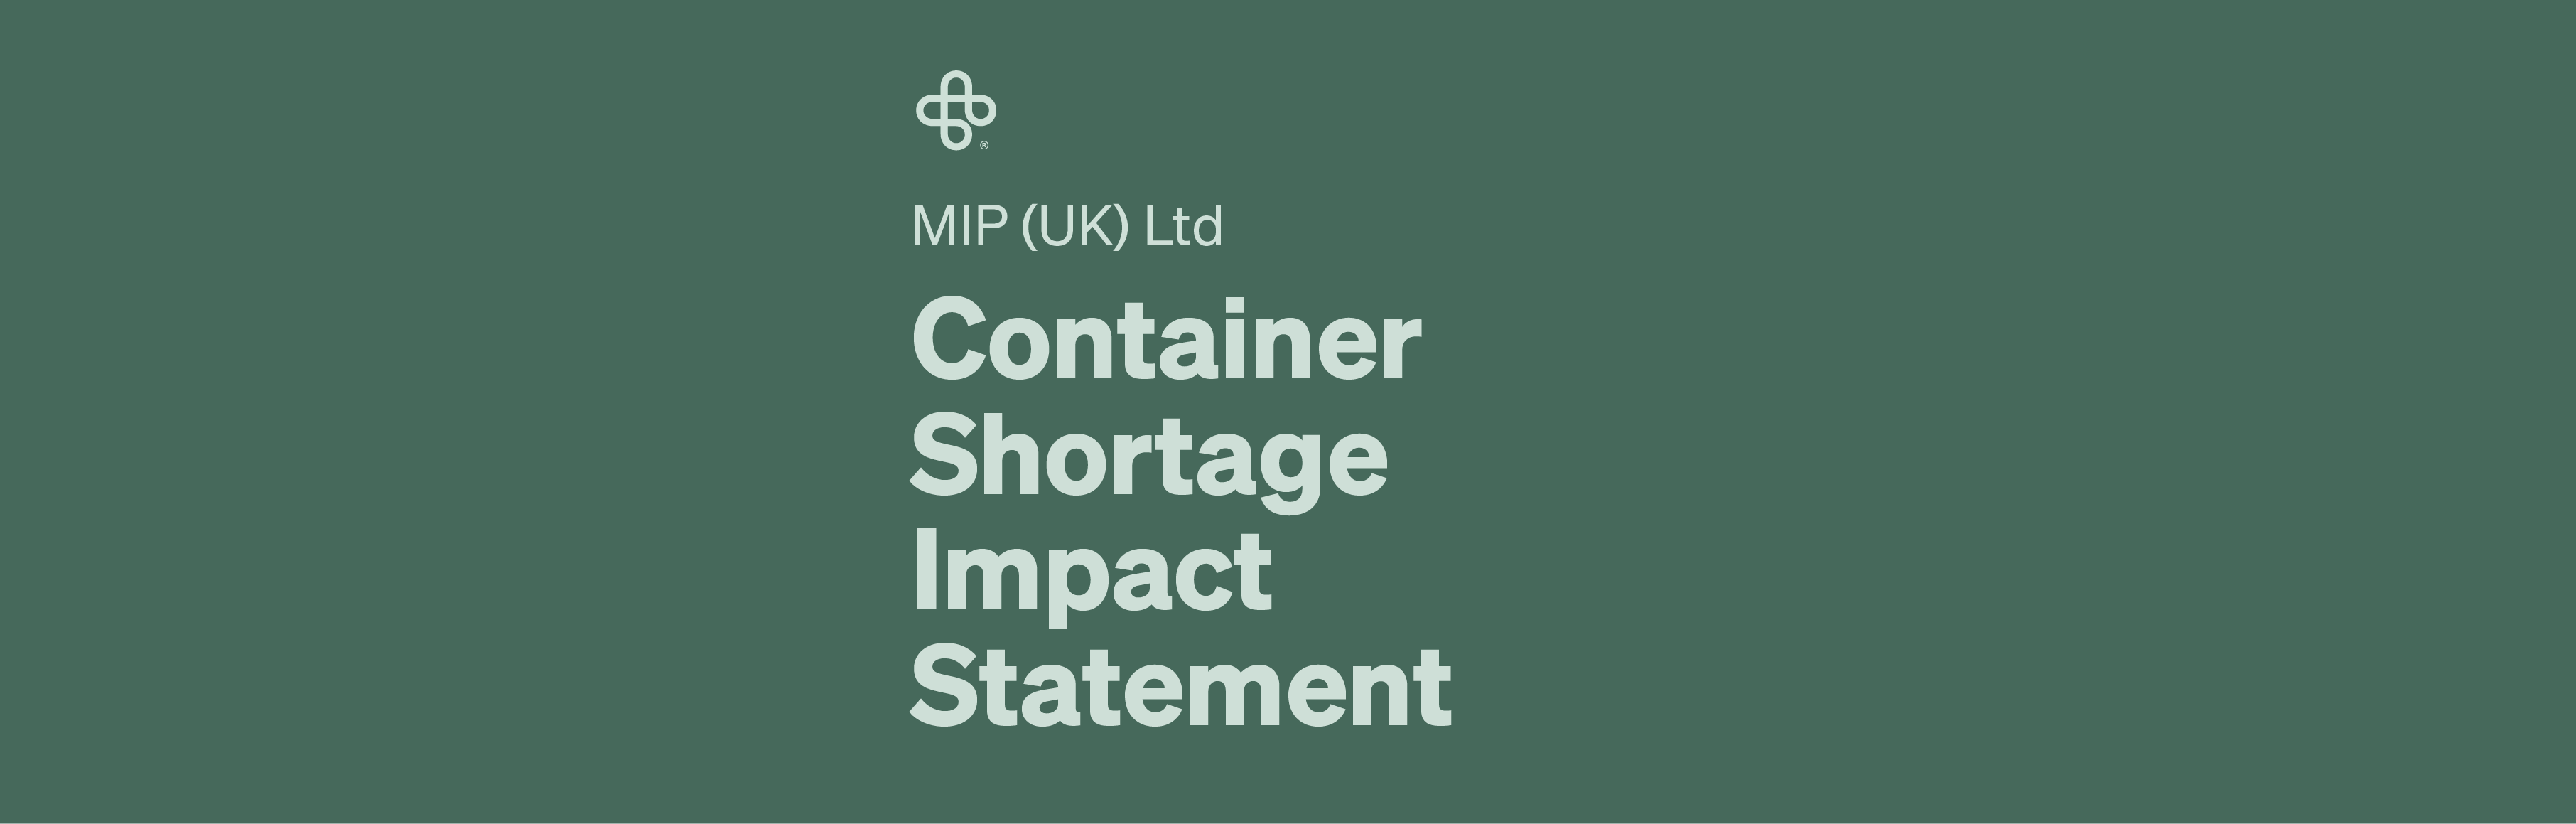 MIP UK Container Shortage Statement - 2021